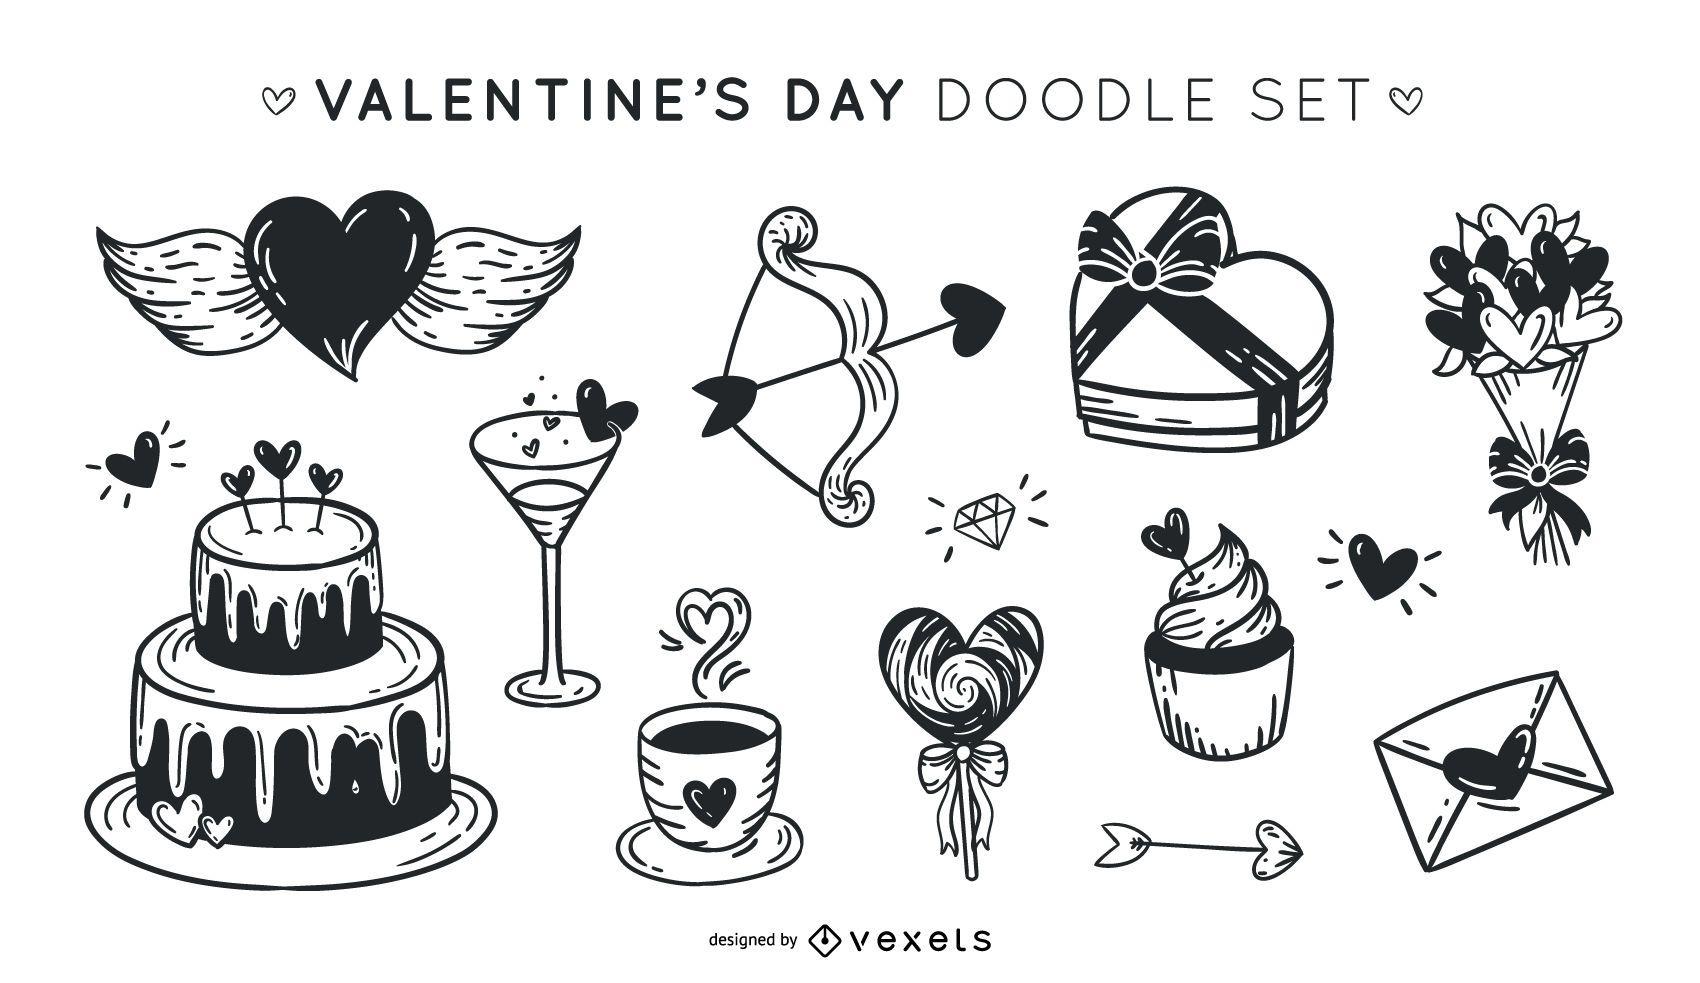 Valentine's day doodle set